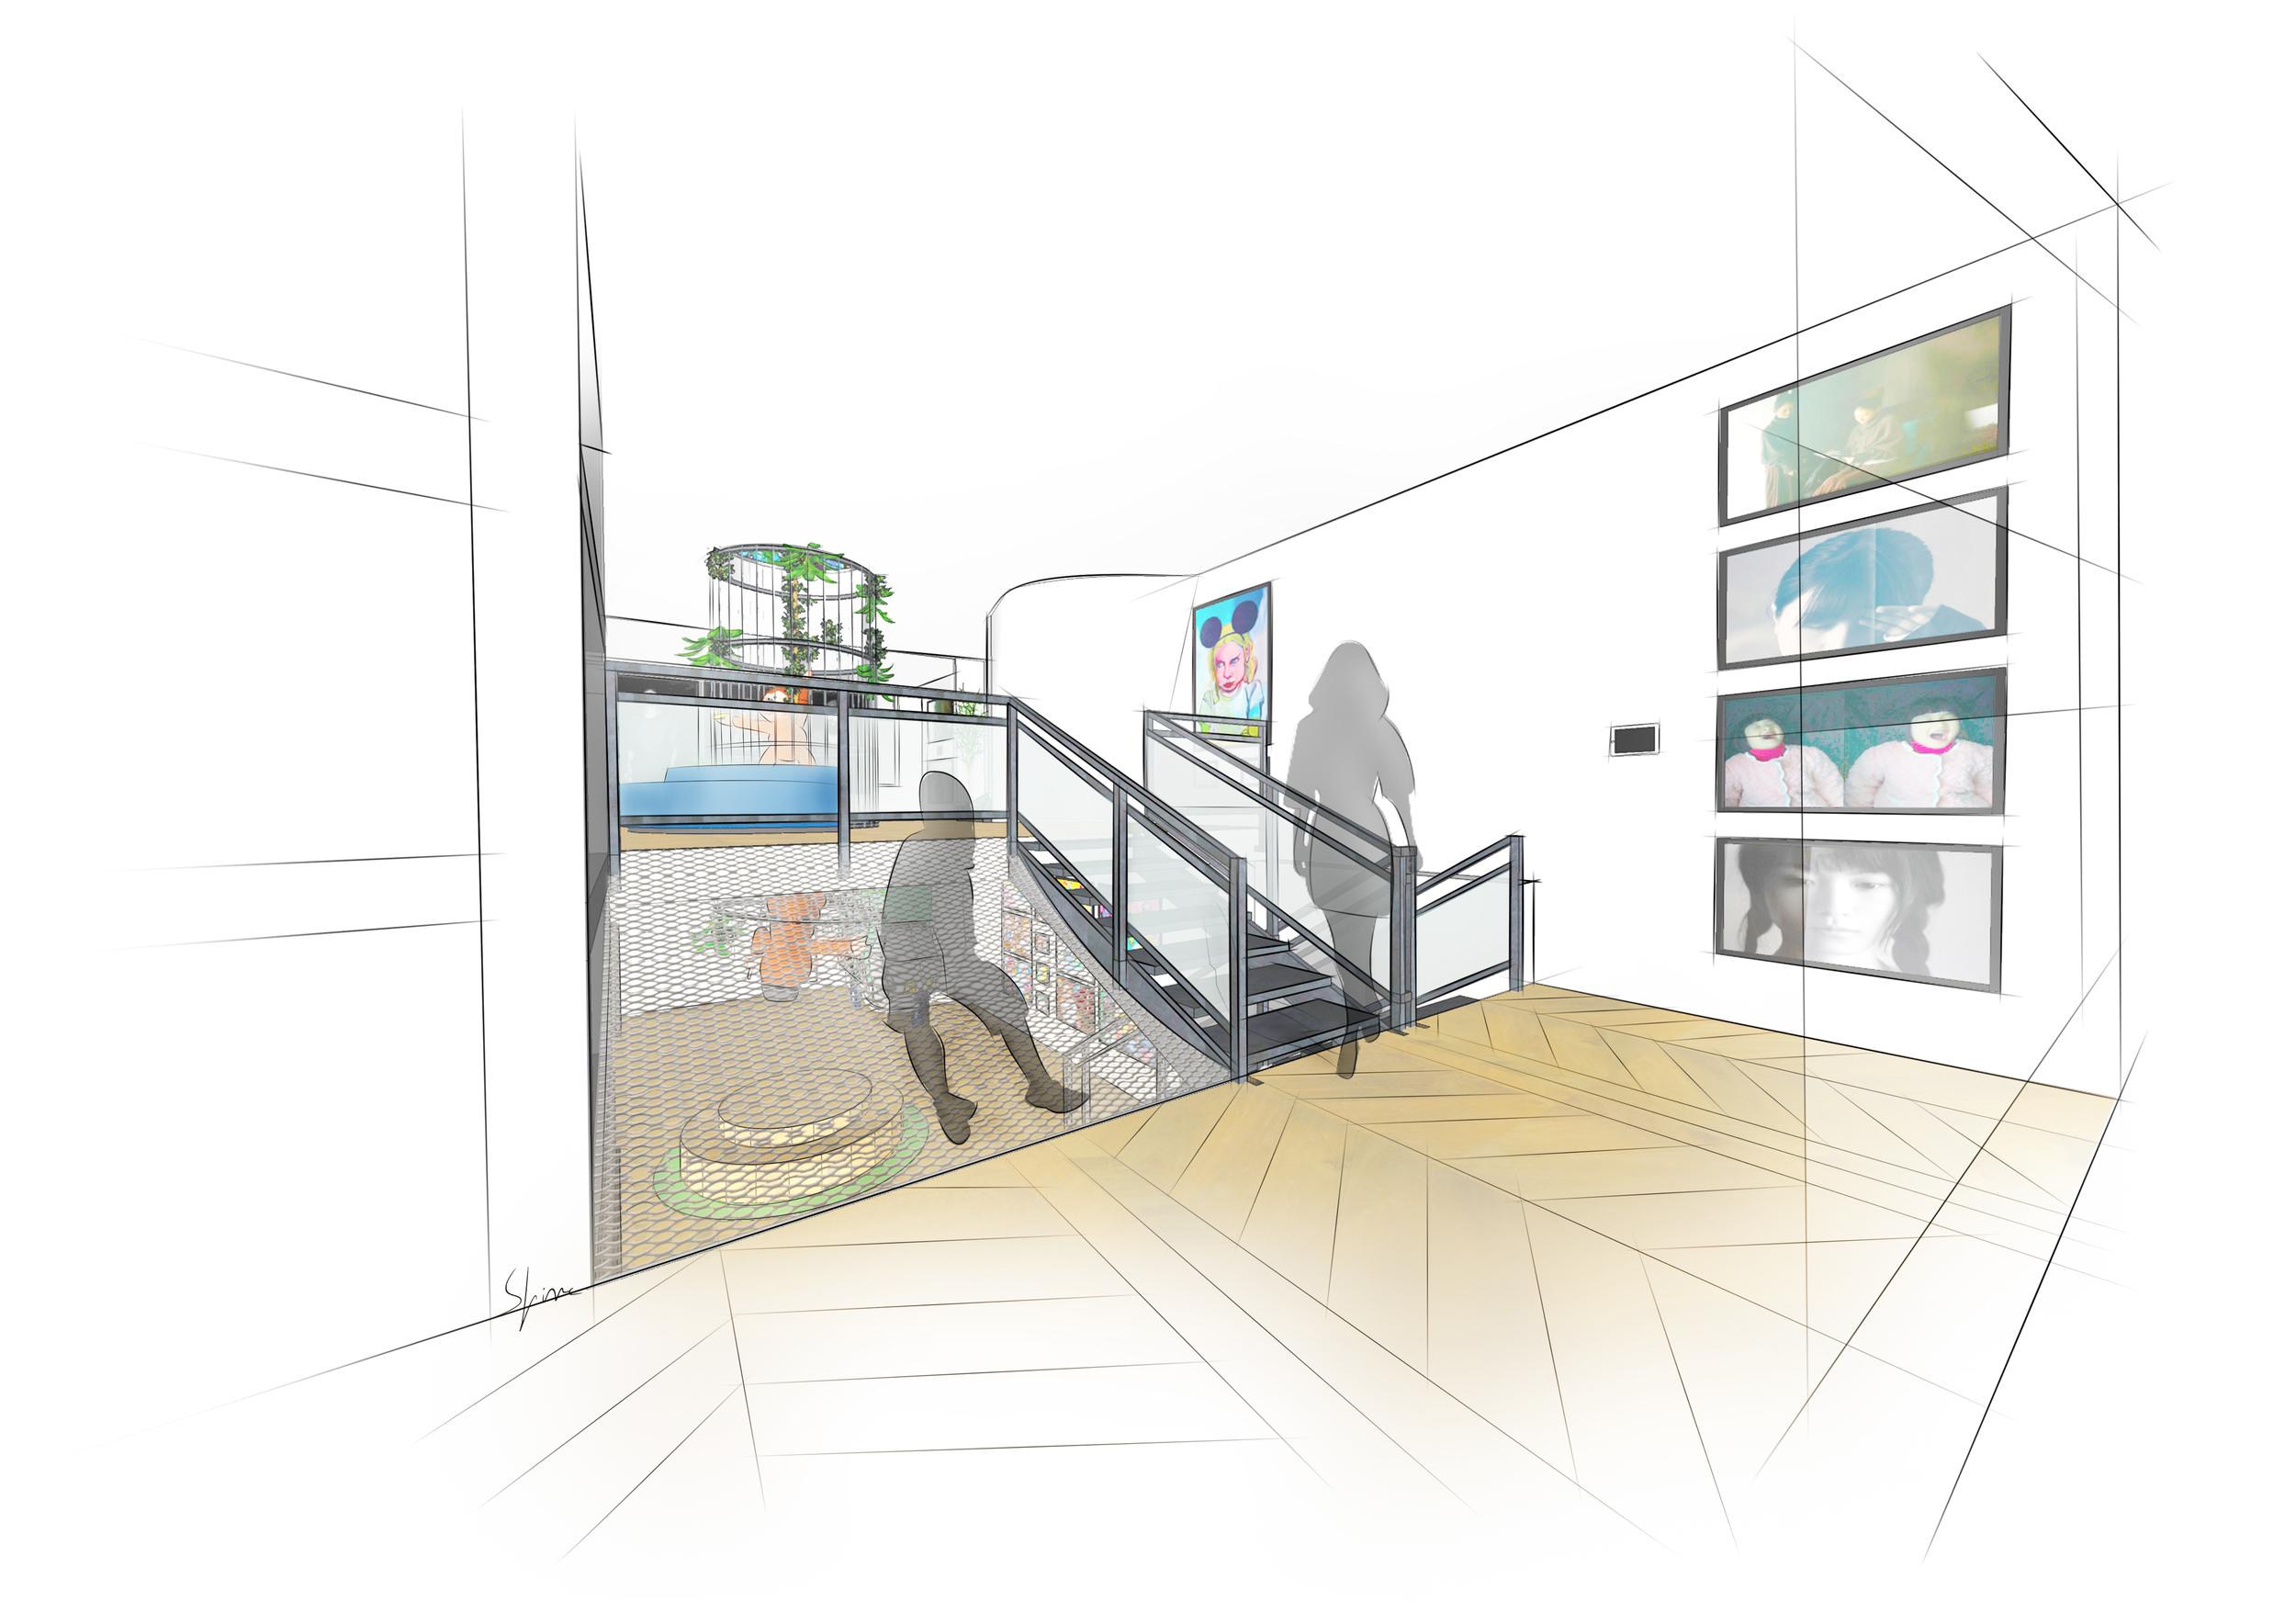 mezzanine_floor.jpg